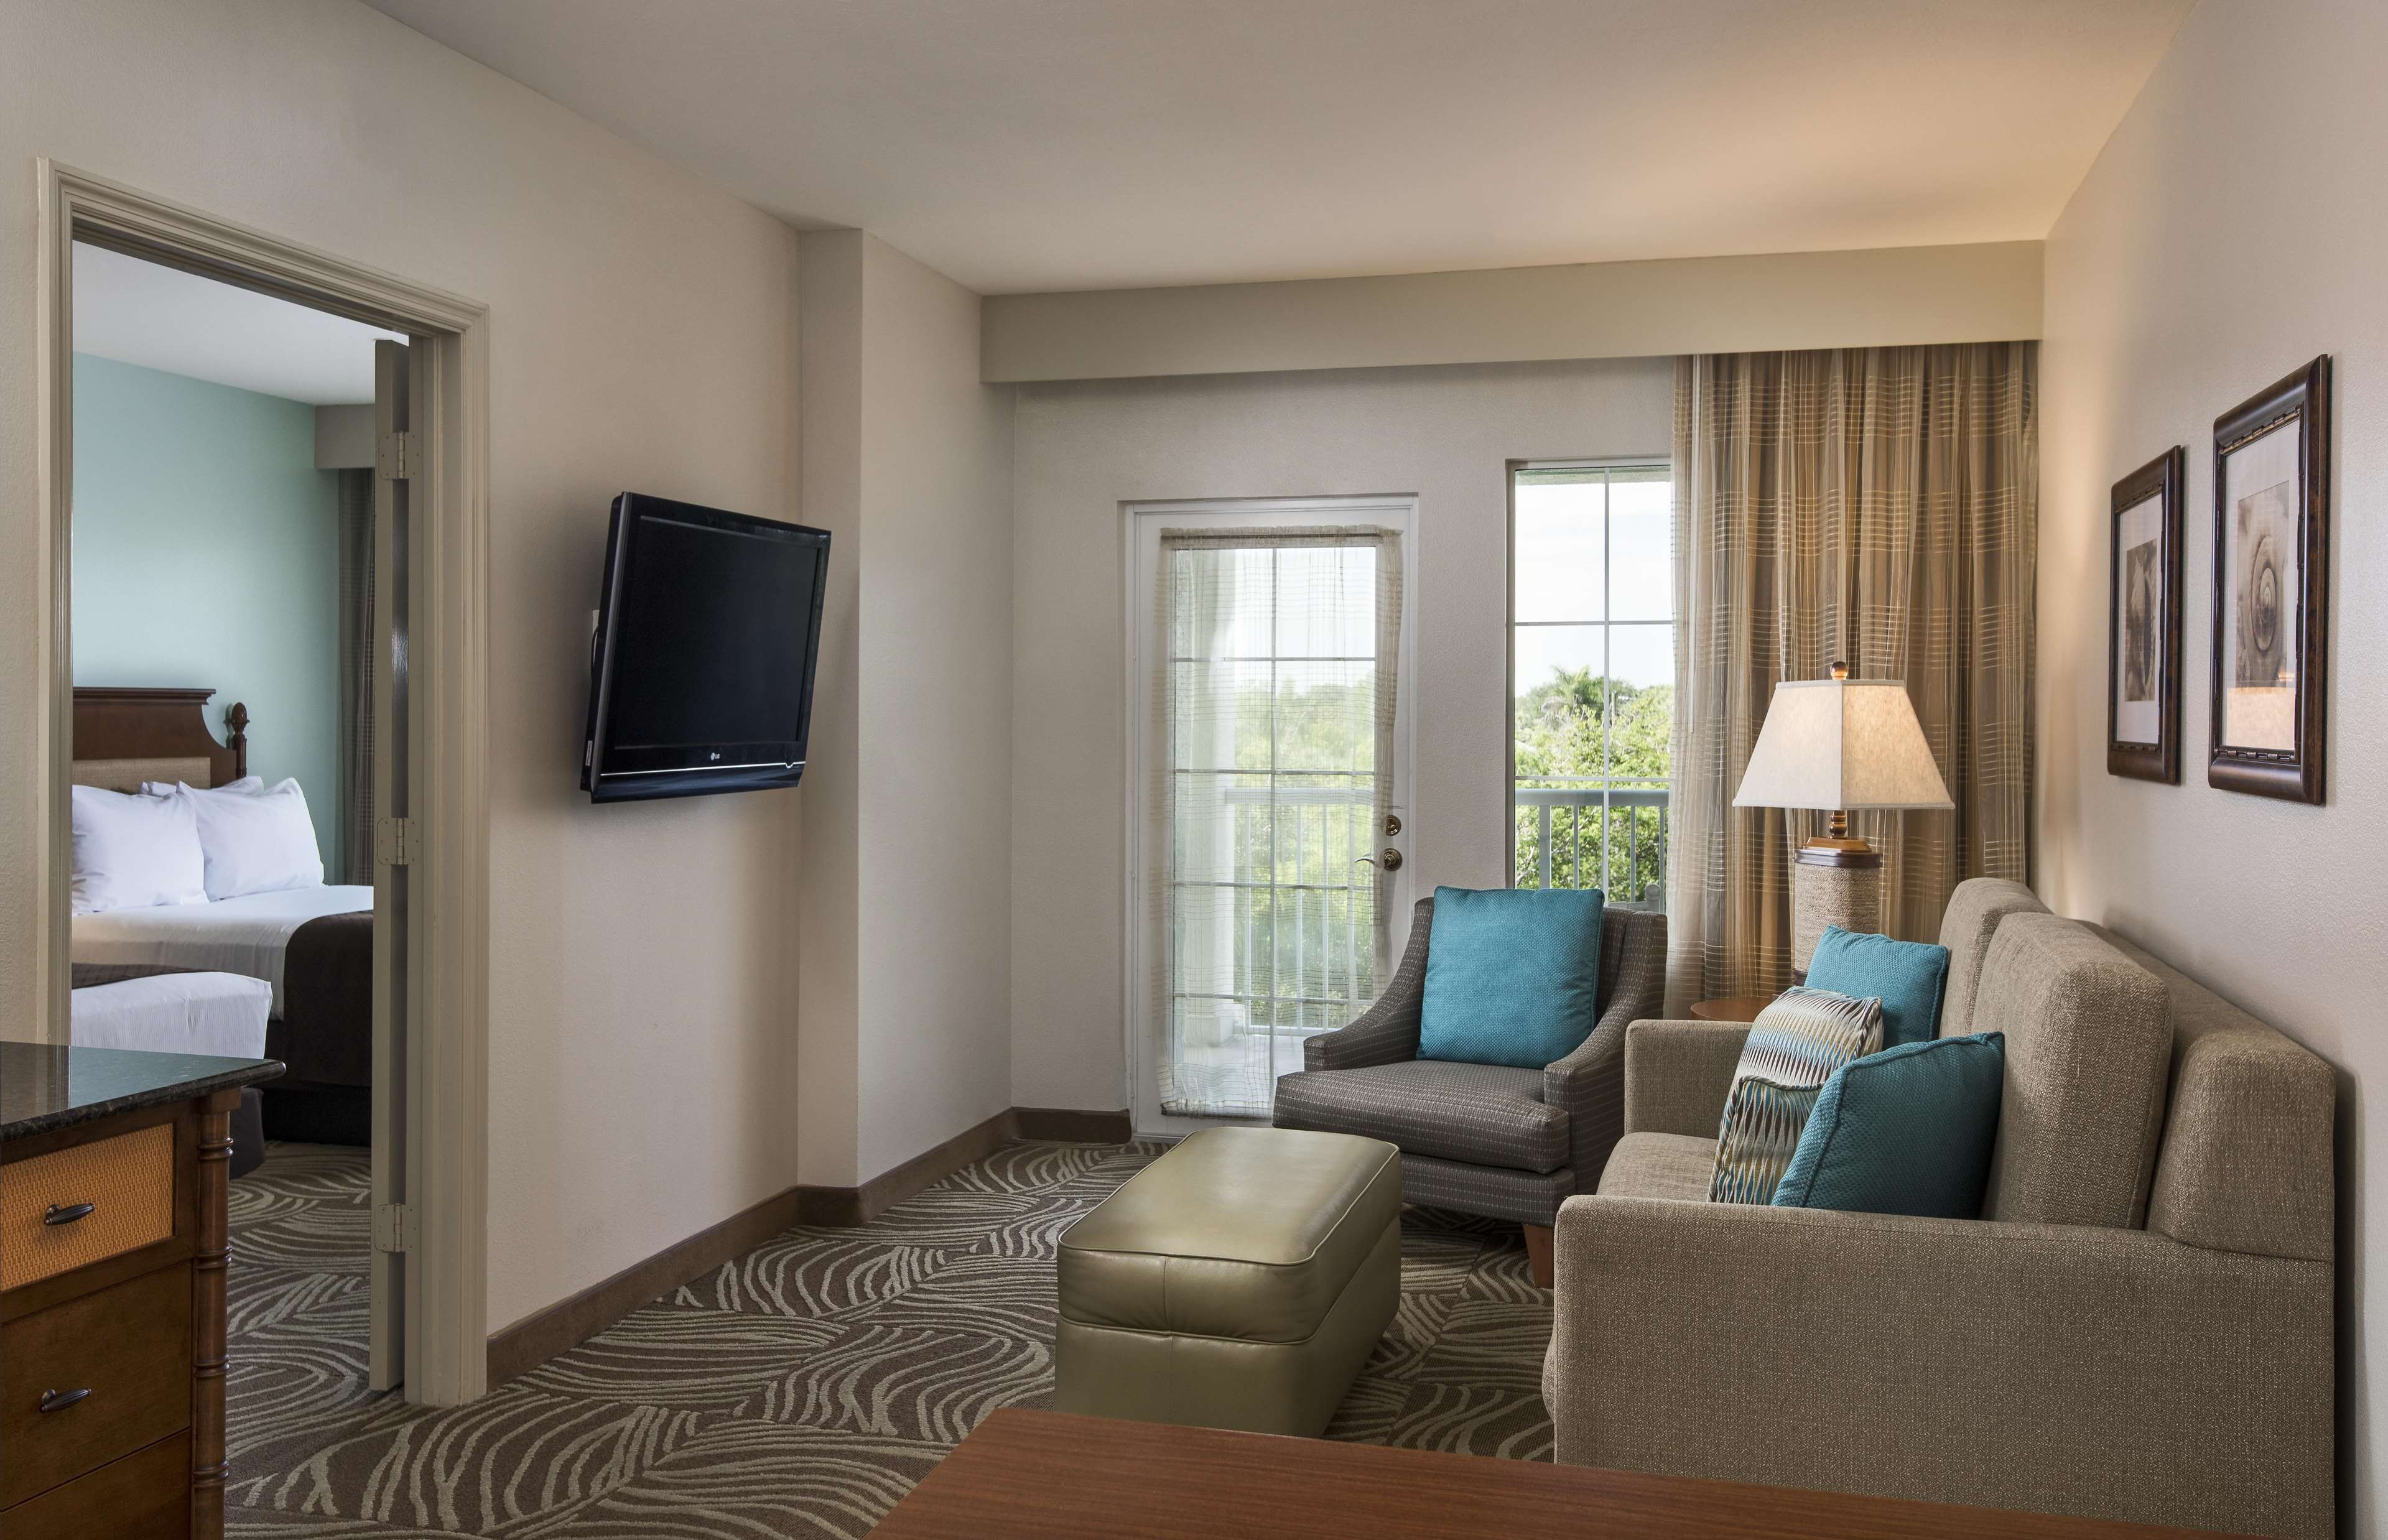 DoubleTree Suites by Hilton Hotel Naples image 25